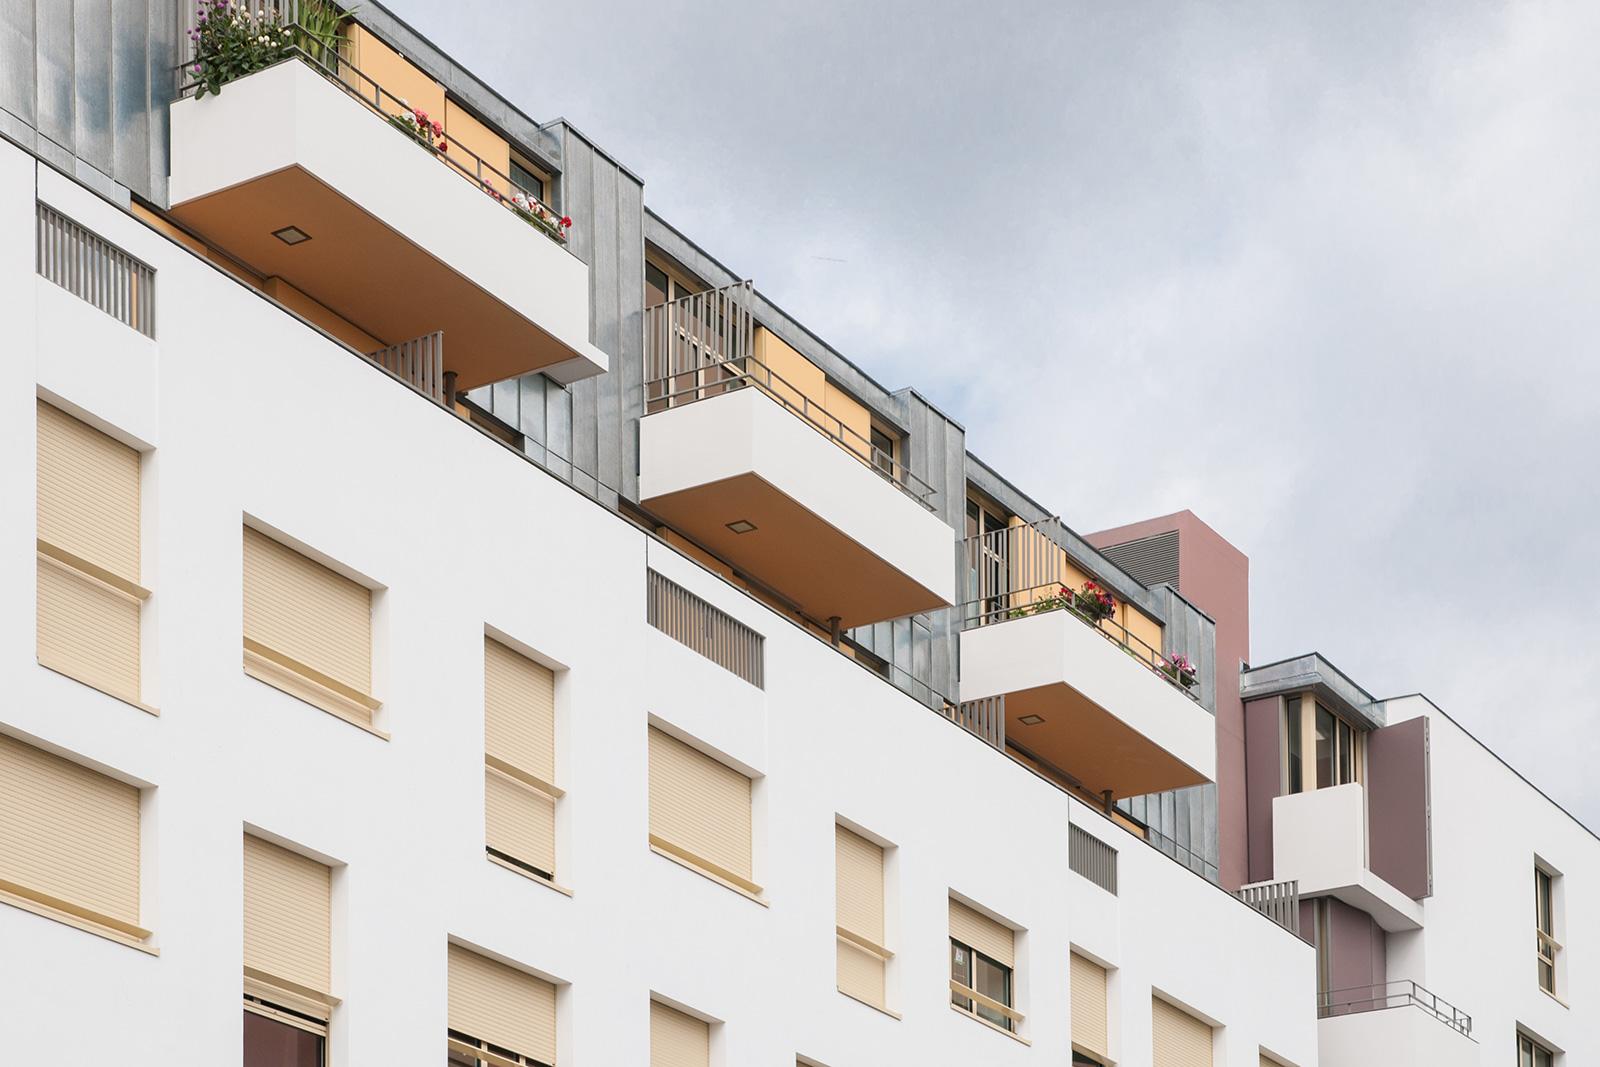 germe-et-jam-RJC-rennes-immeuble-cartier-facade-rue-alma-02